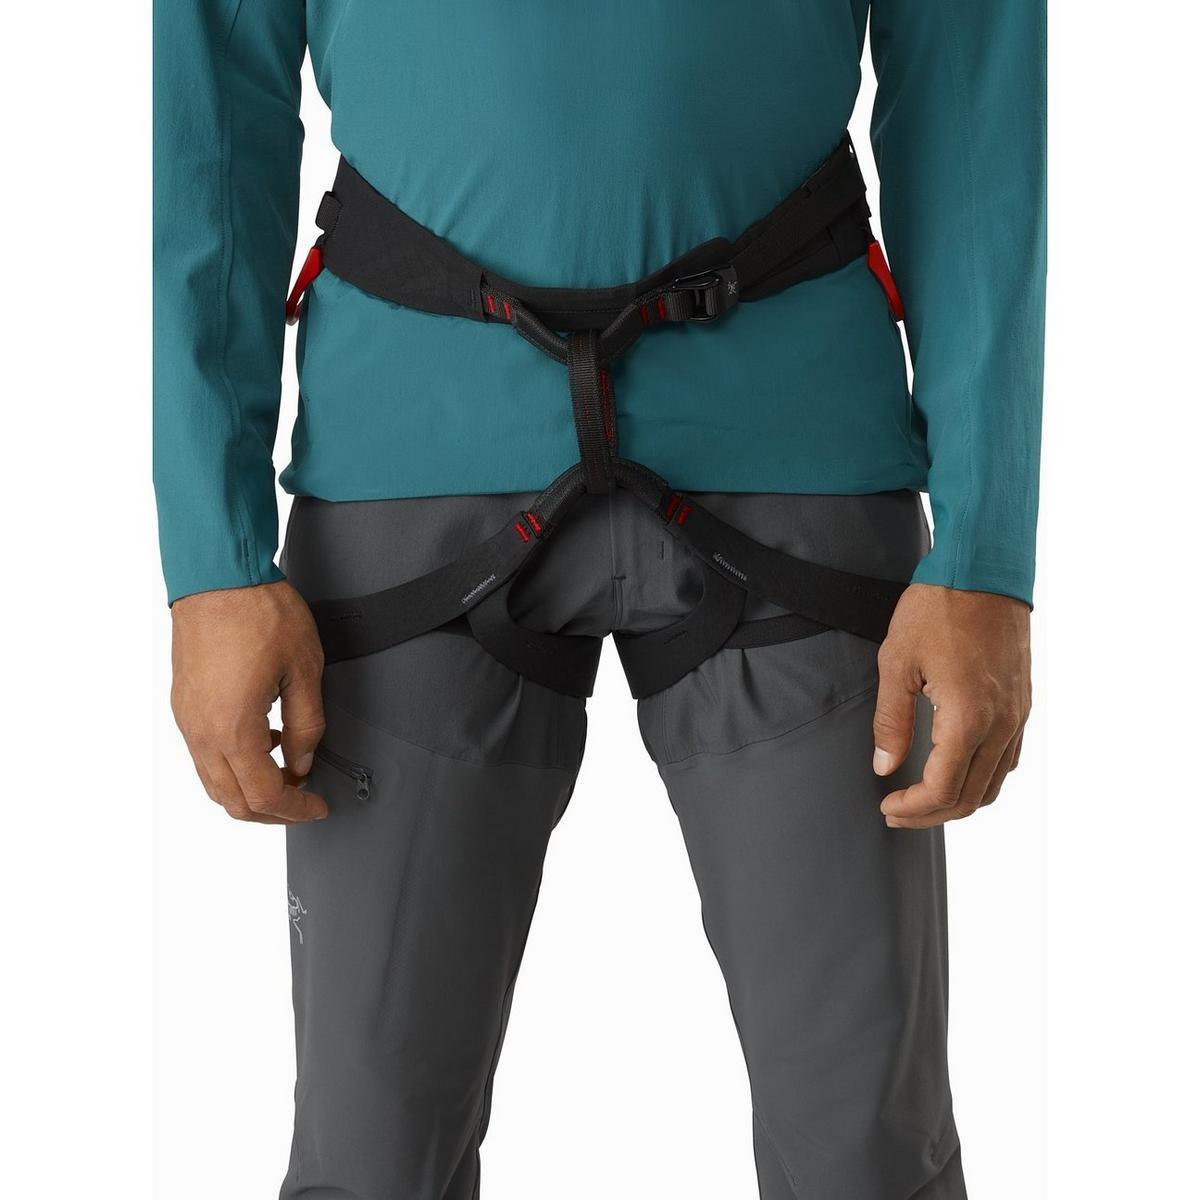 Arcteryx Men's C-Quence Harness